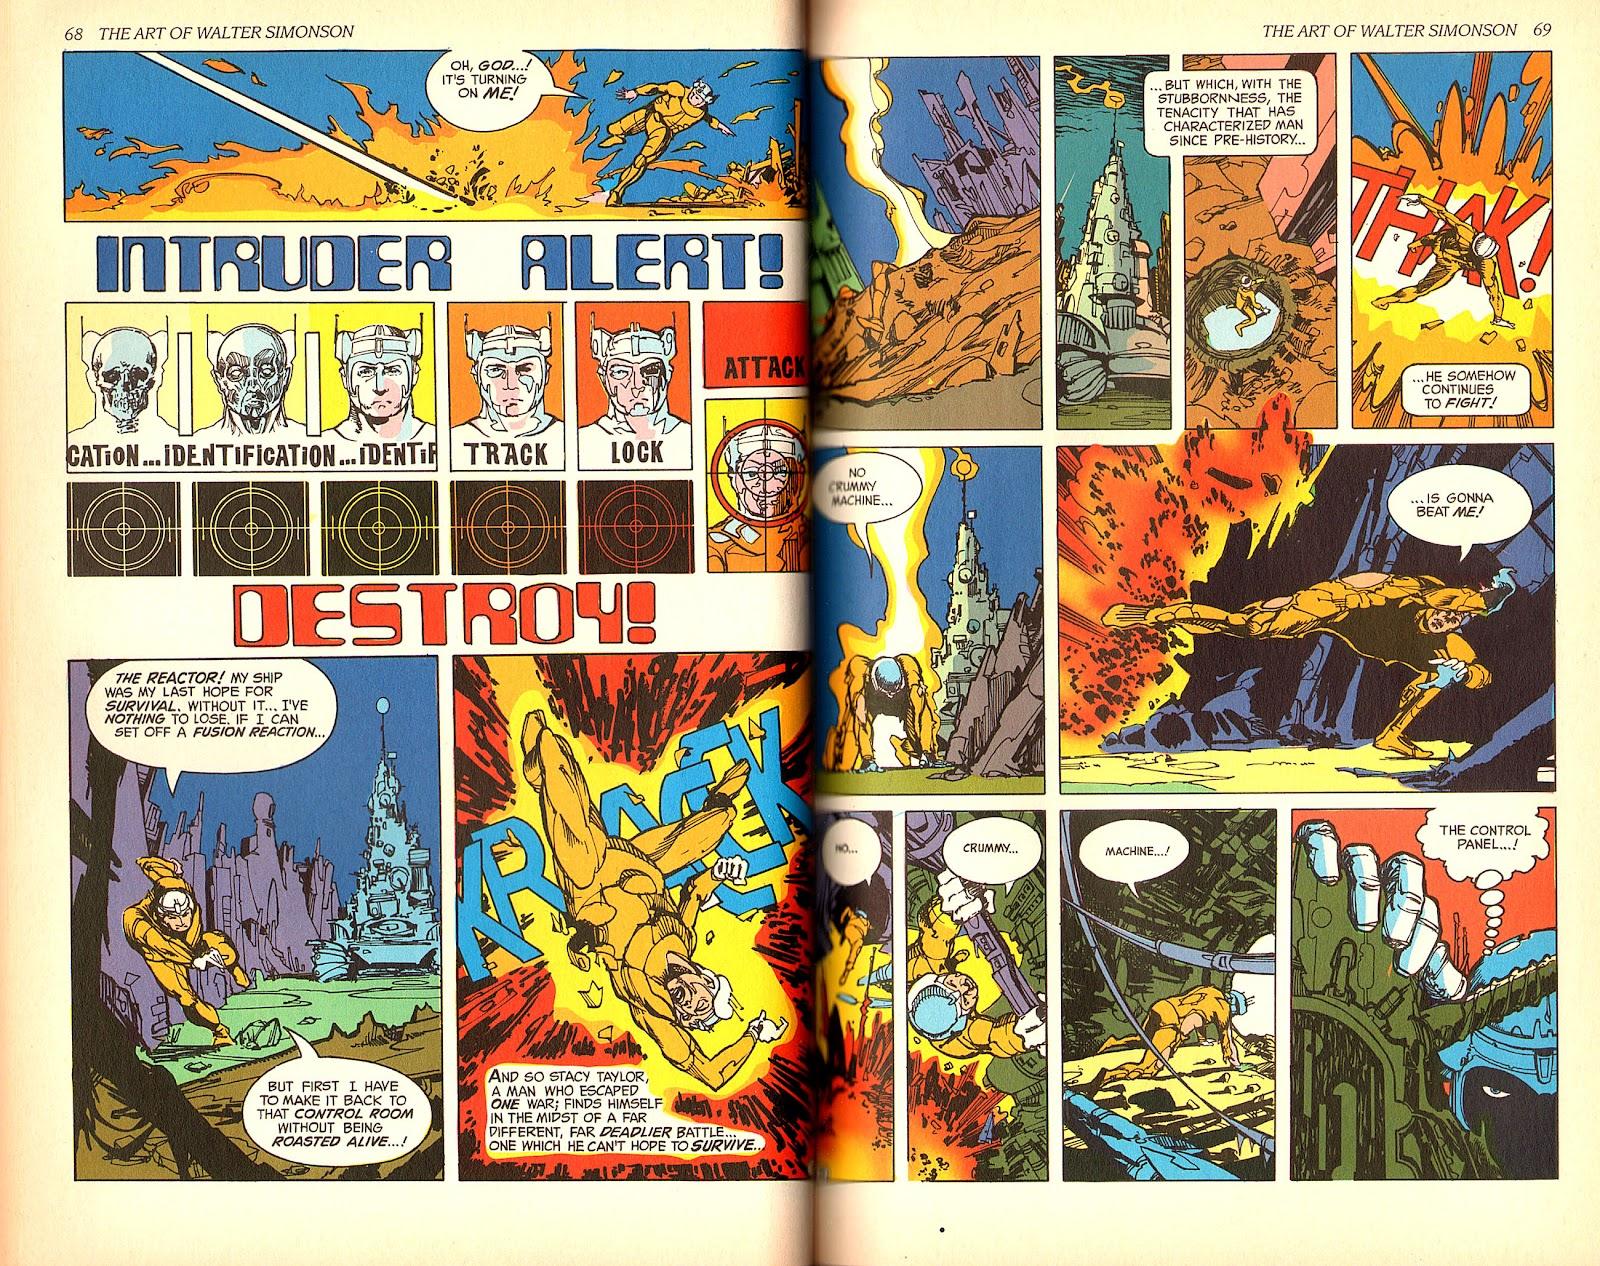 Read online The Art of Walter Simonson comic -  Issue # TPB - 36